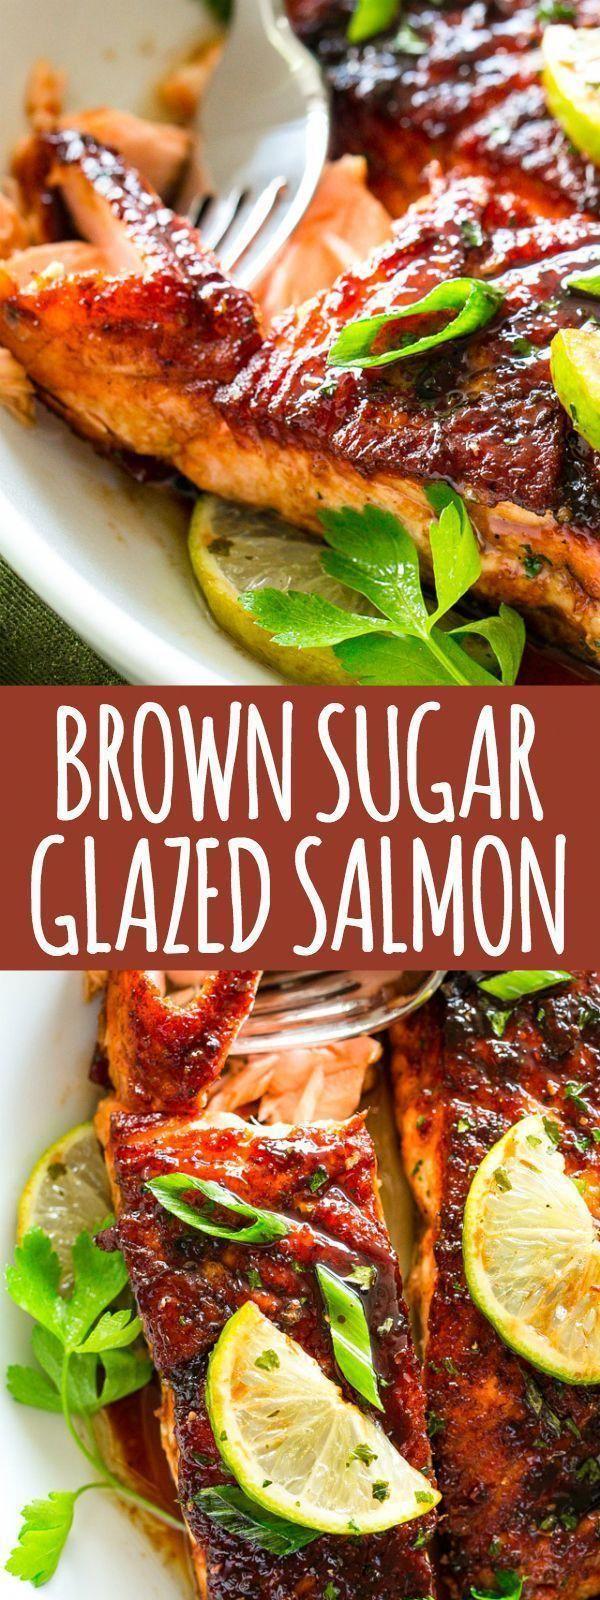 Sugar Glazed Salmon Recipe – Crispy on the outside, tender on the inside... -Brown Sugar Glazed S